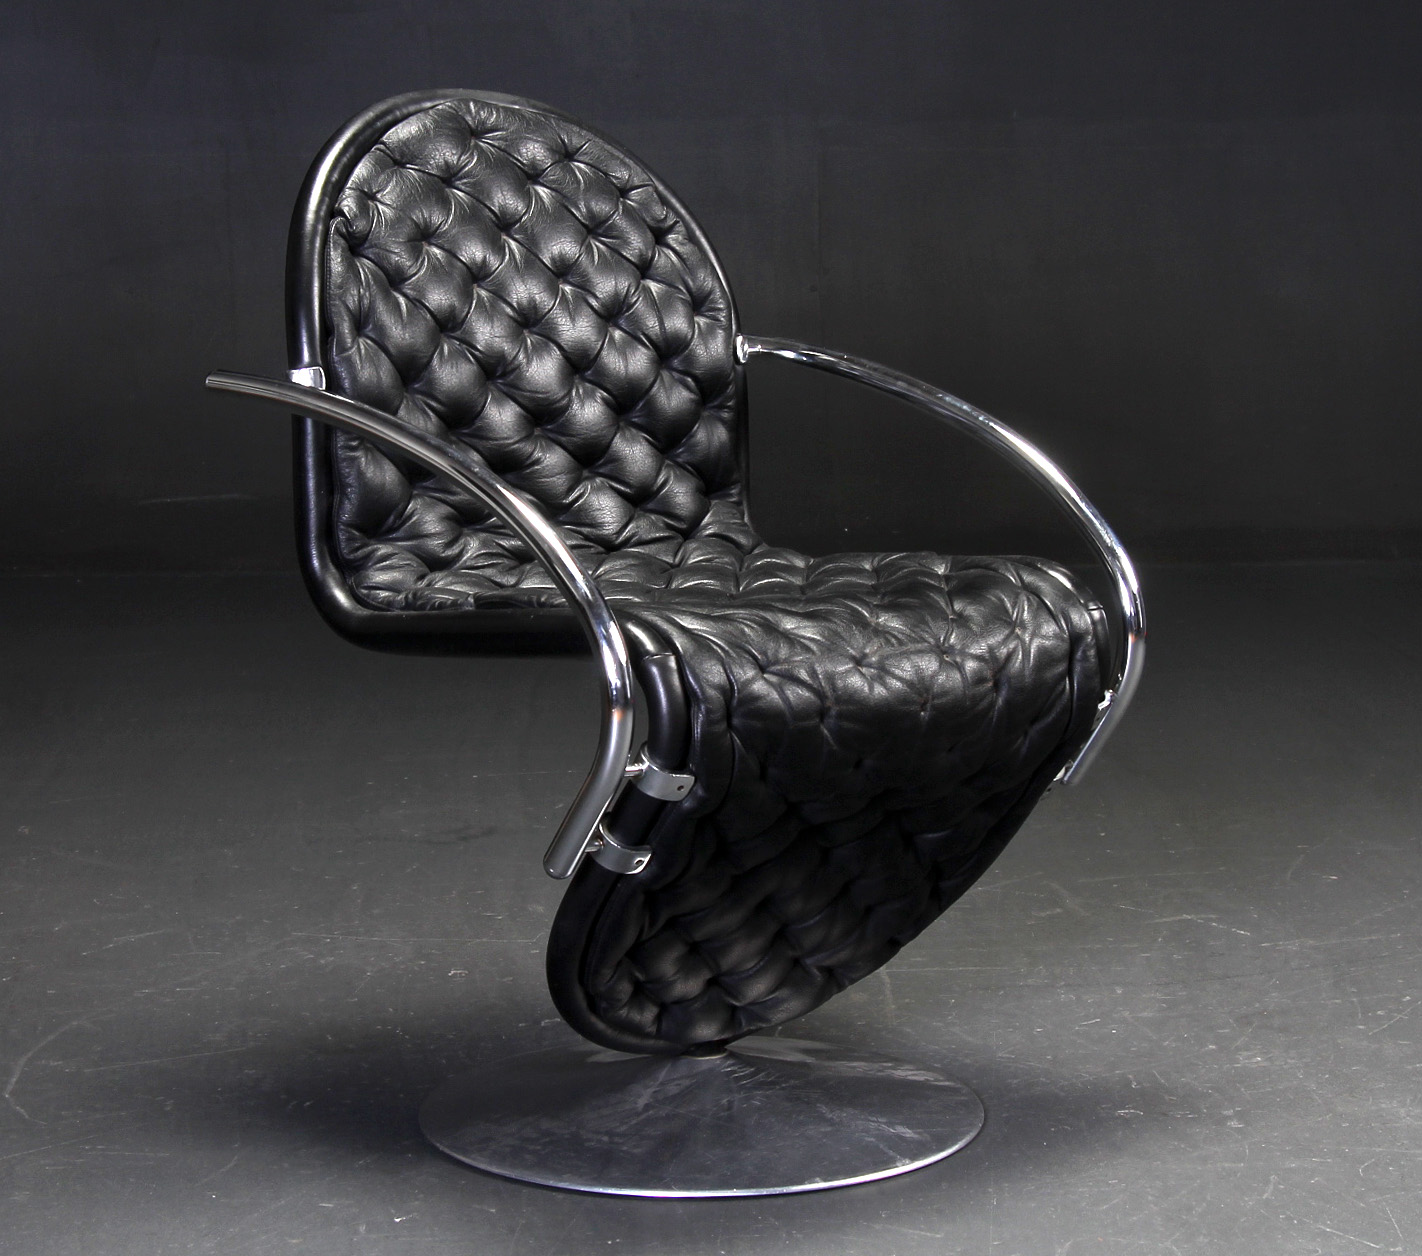 stuhl panton awesome sstuhl mod entwurf verner panton with stuhl panton free c stuhl von vitra. Black Bedroom Furniture Sets. Home Design Ideas